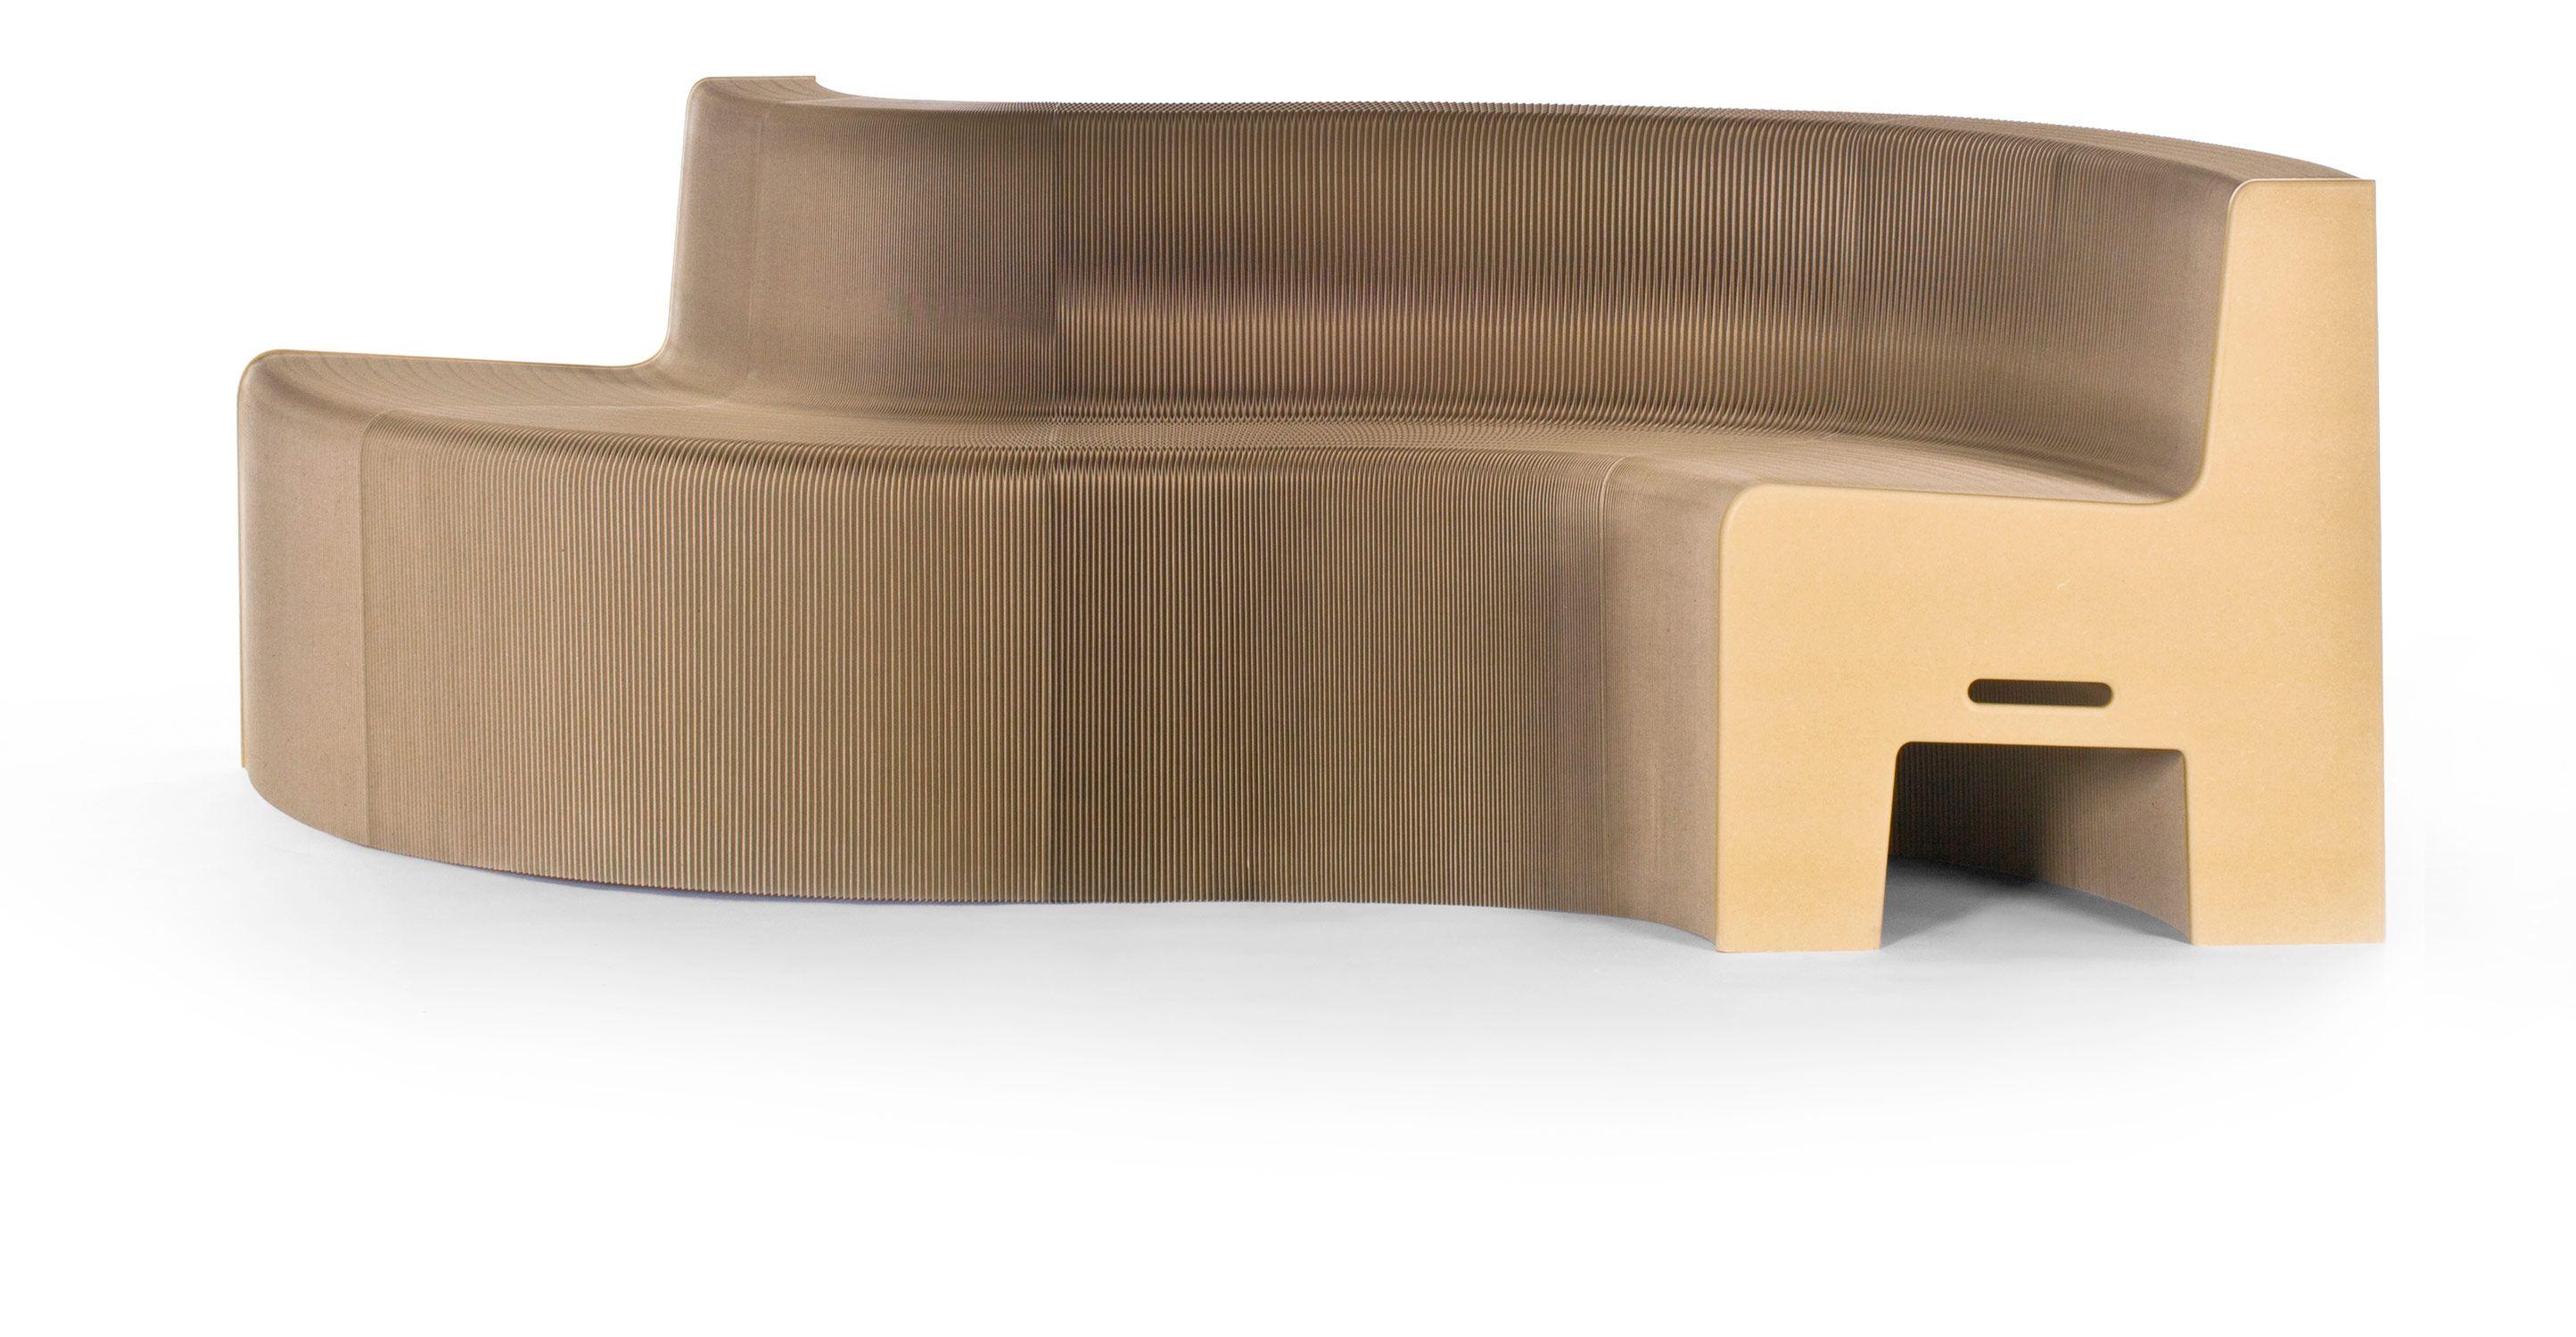 Superior Flexible Love 8 Chair, Earth Brown Awesome Ideas